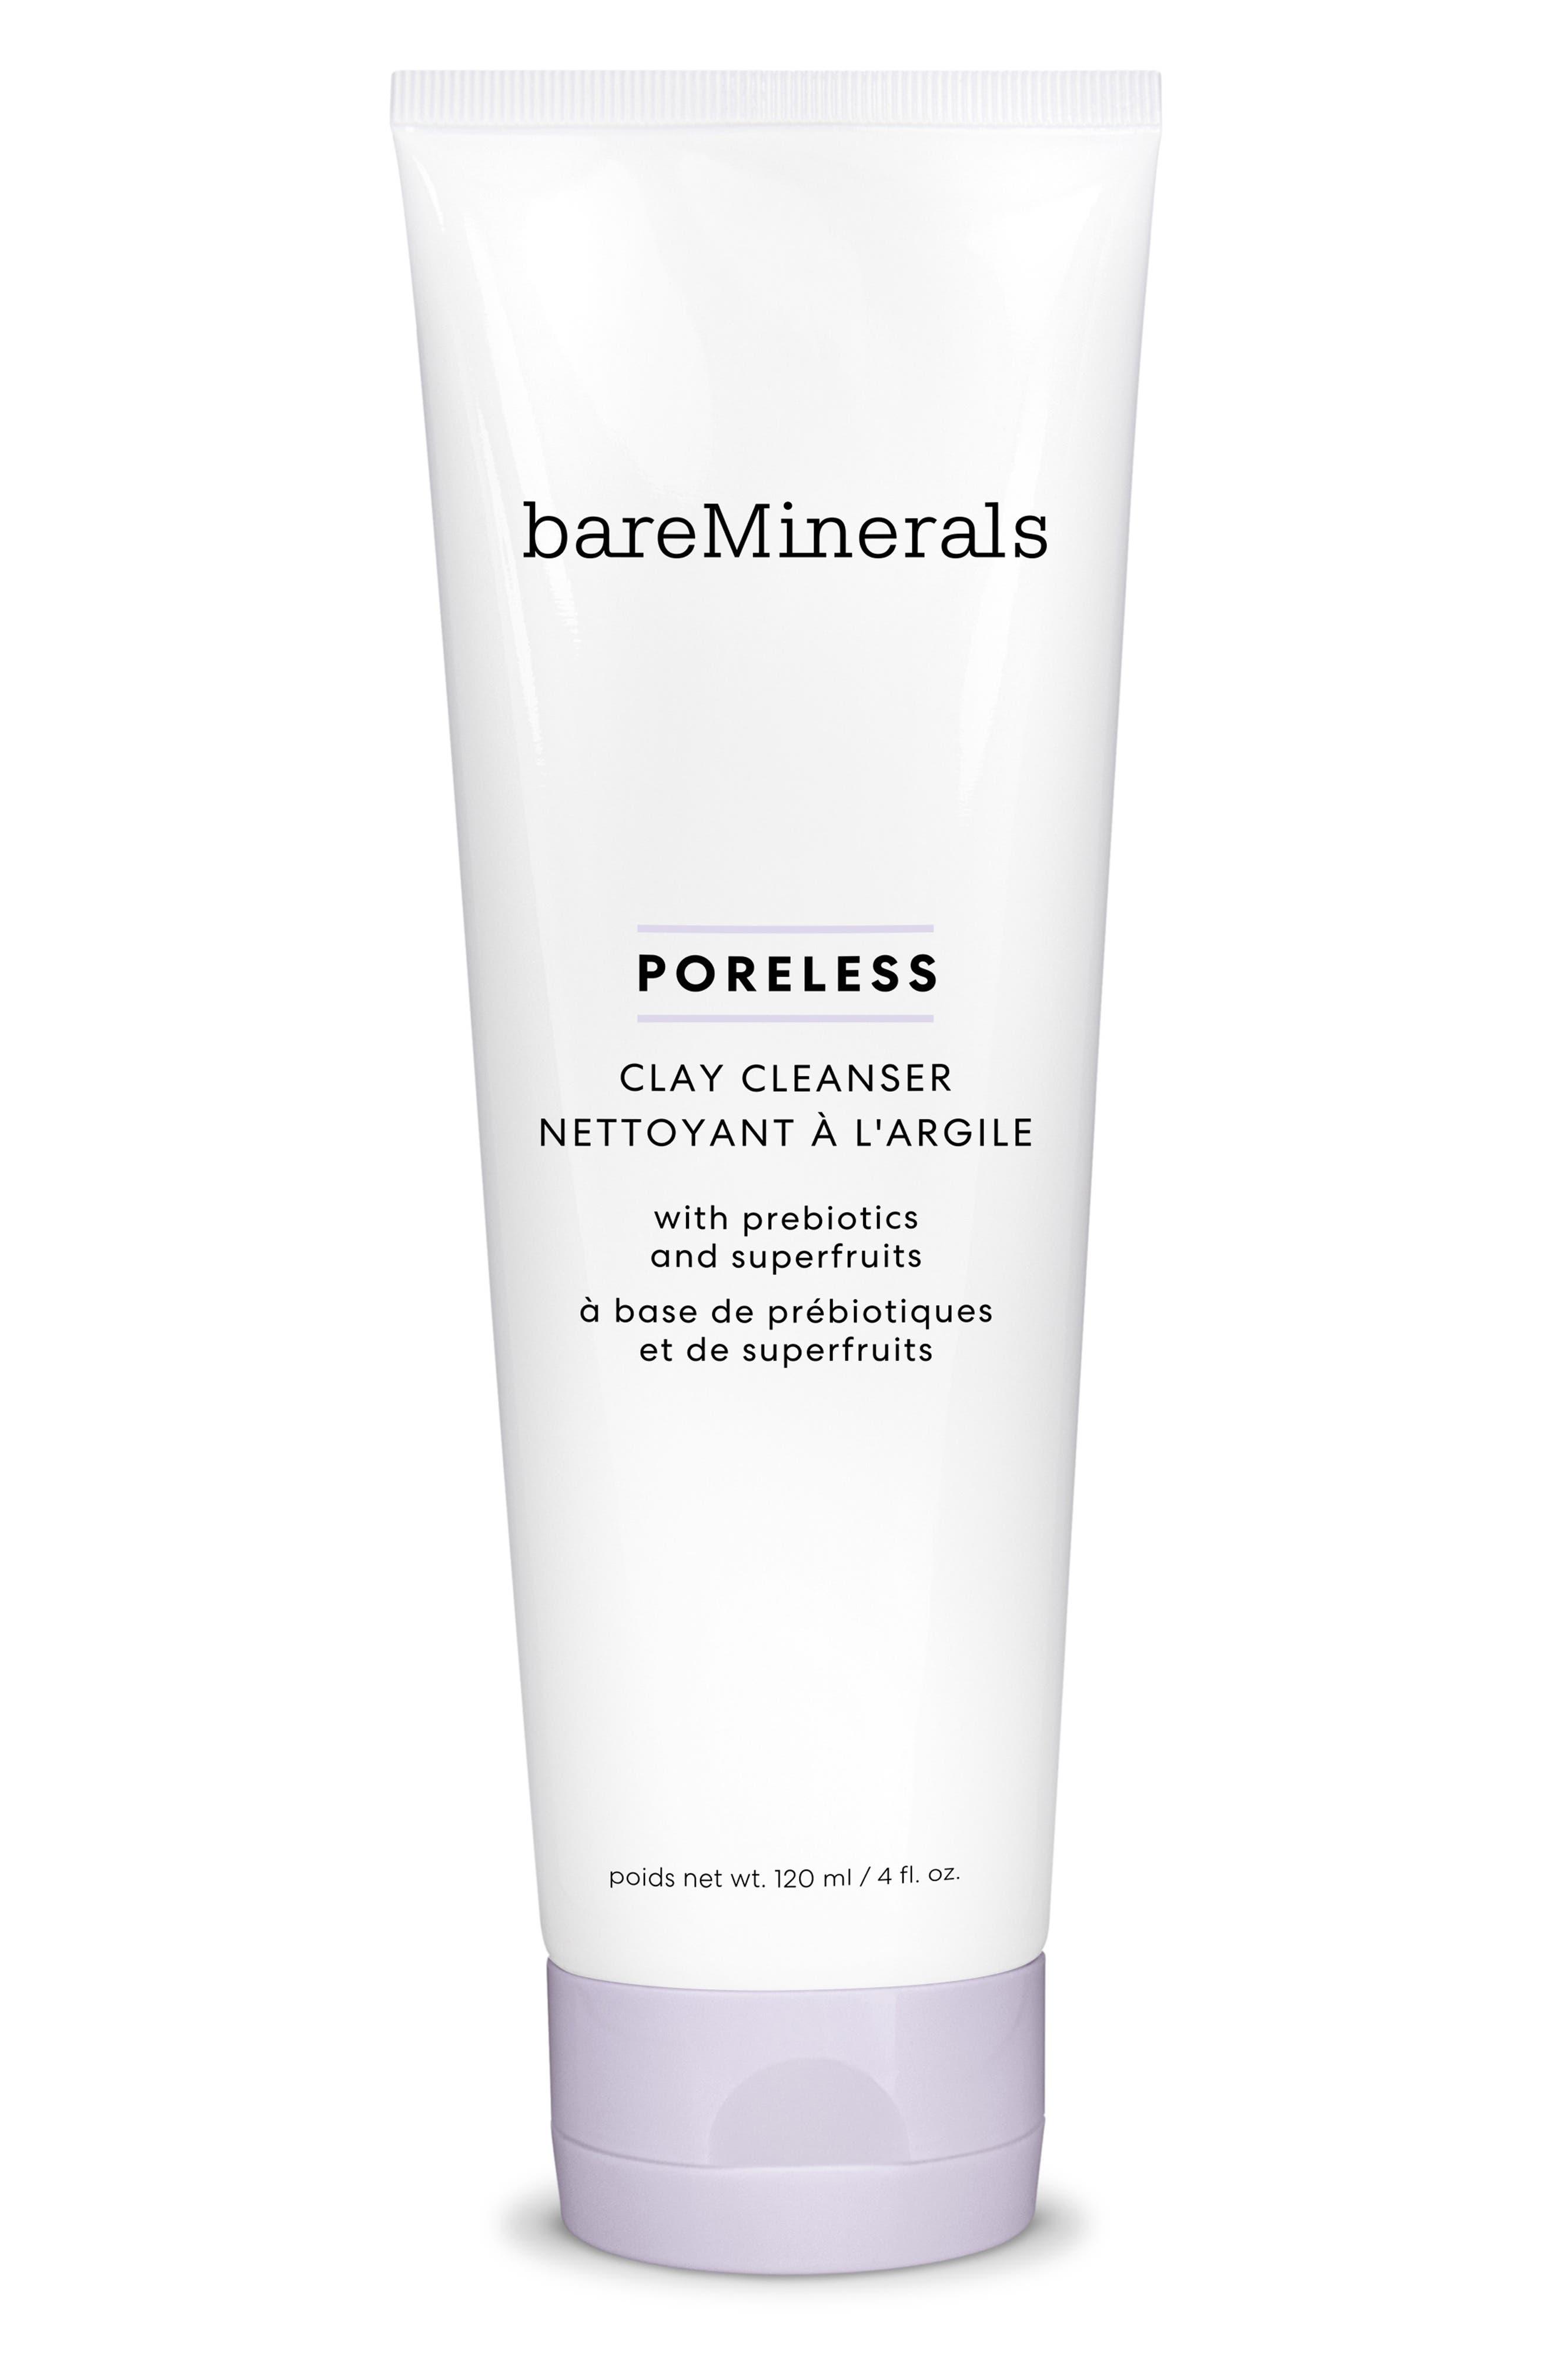 Bareminerals Poreless Clay Cleanser